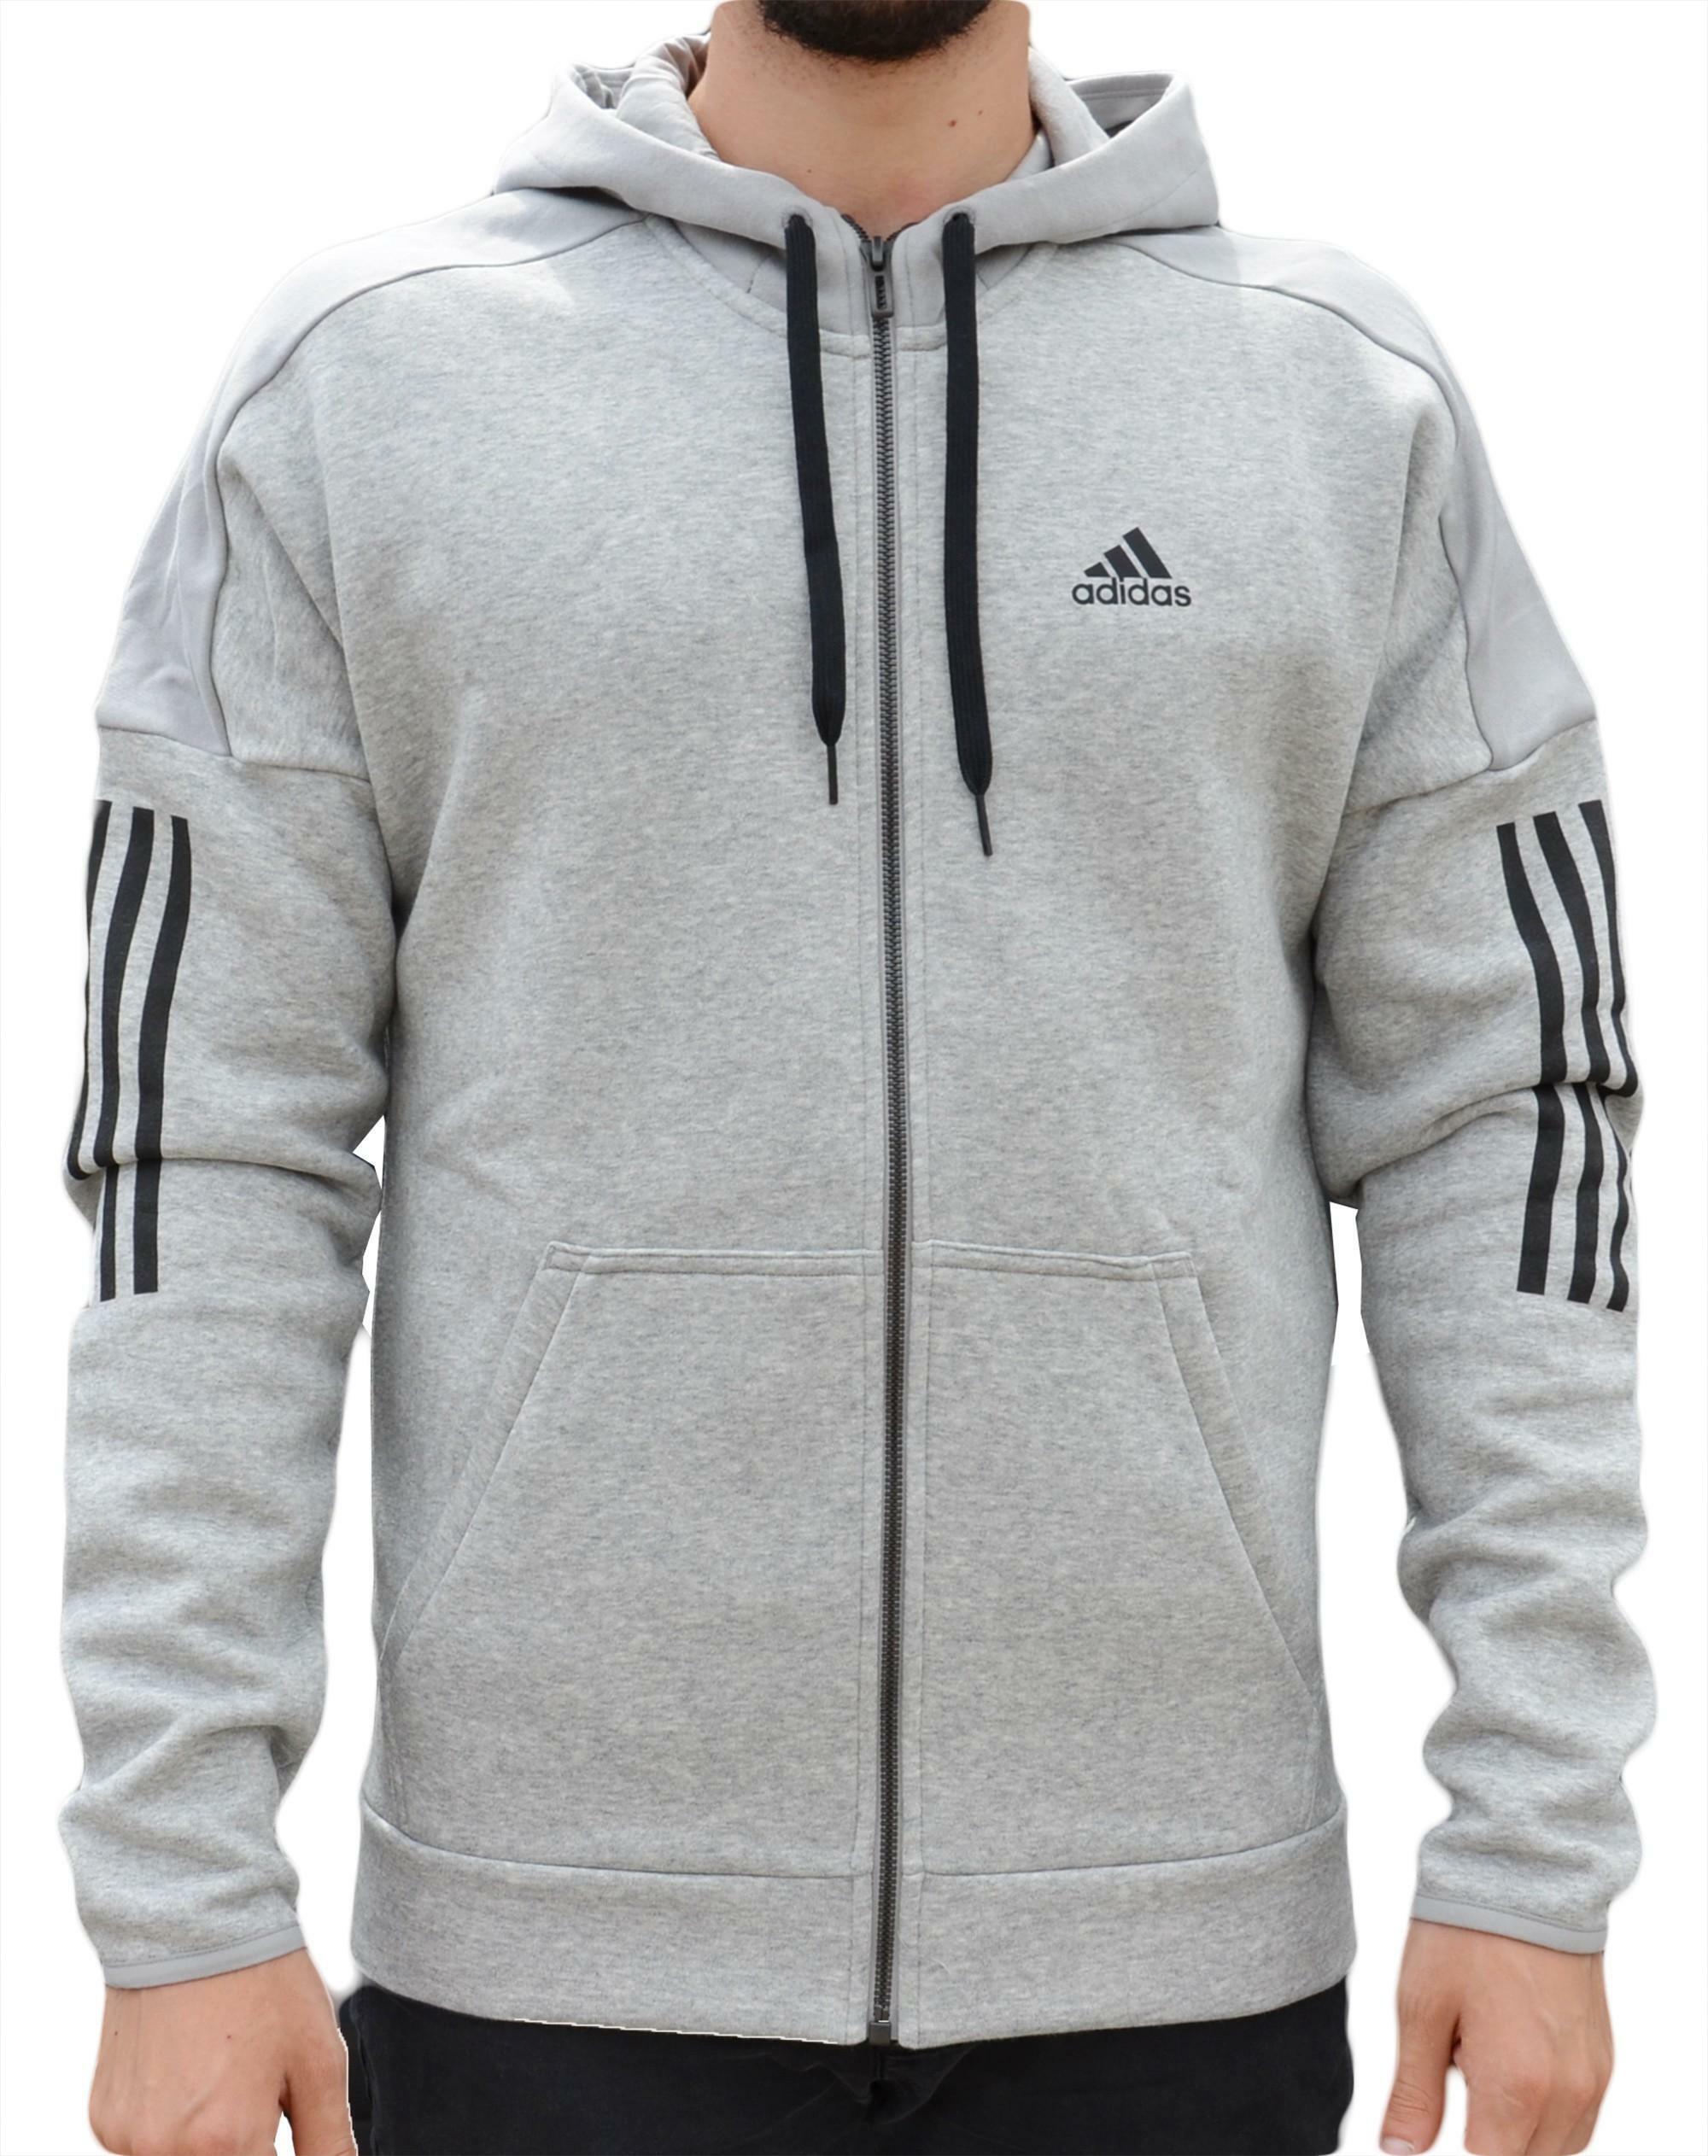 adidas adidas side logo giacchetto uomo grigio dm7588